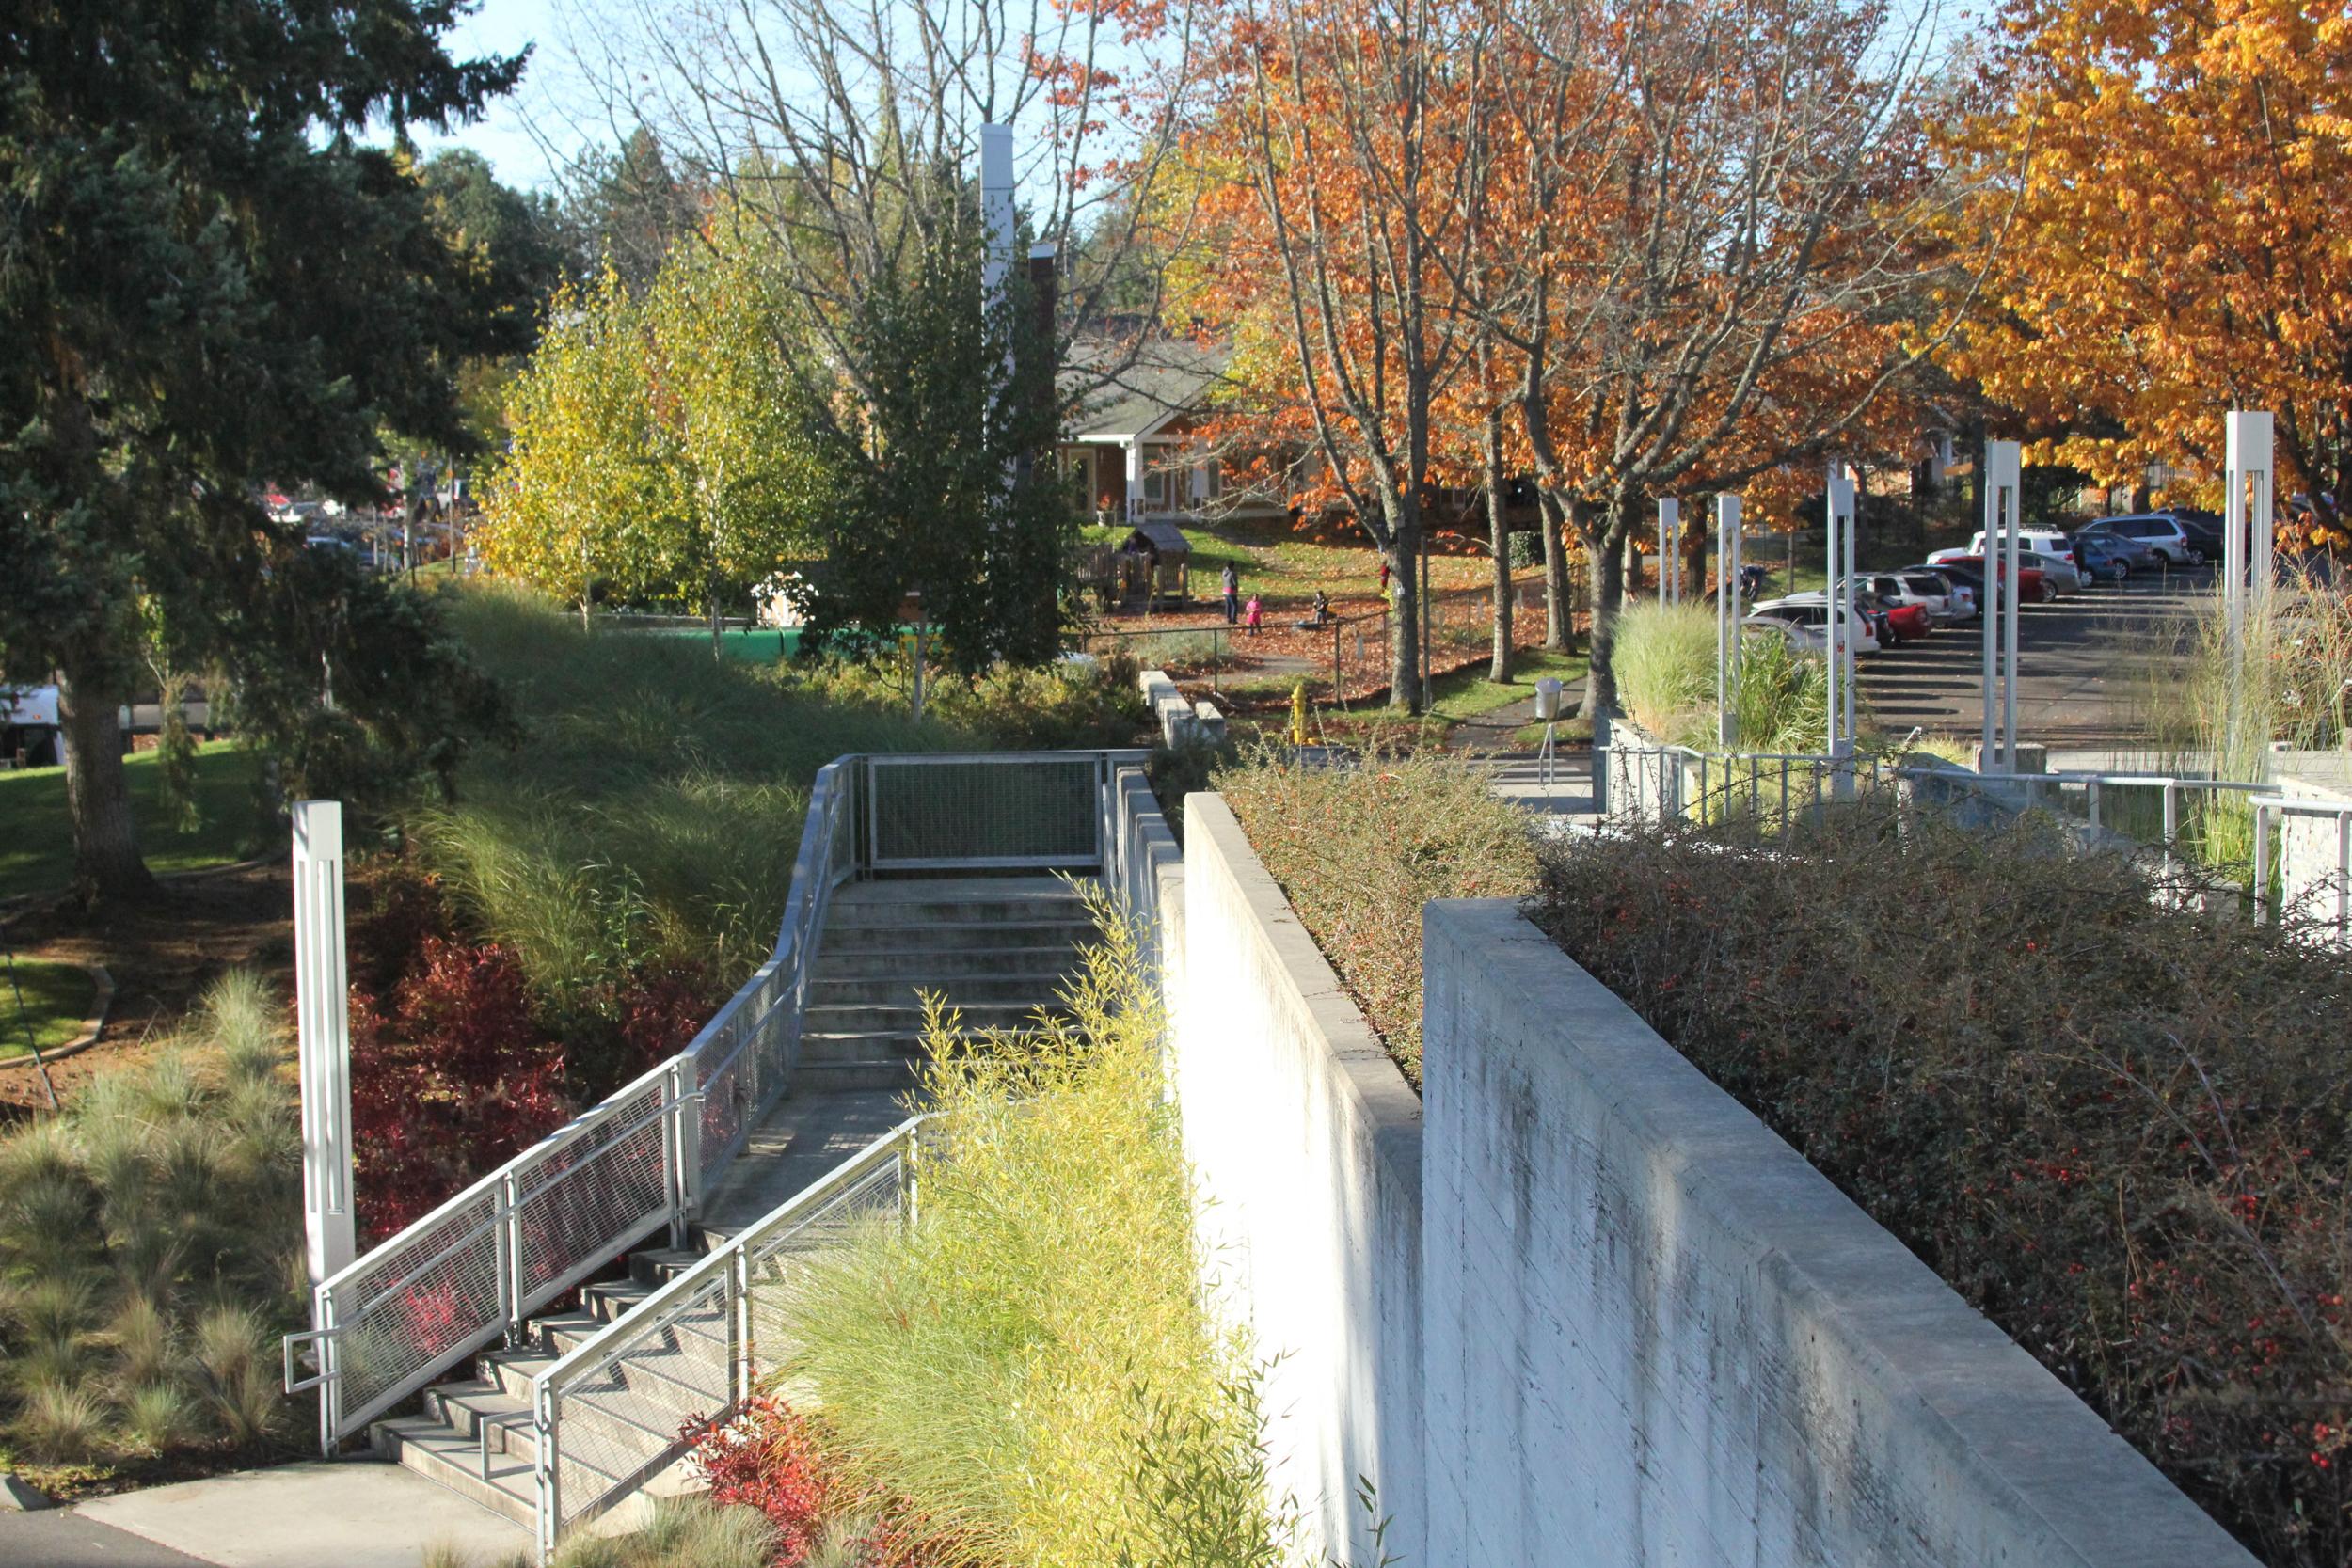 landscapeto strengthen identity of Pierce College